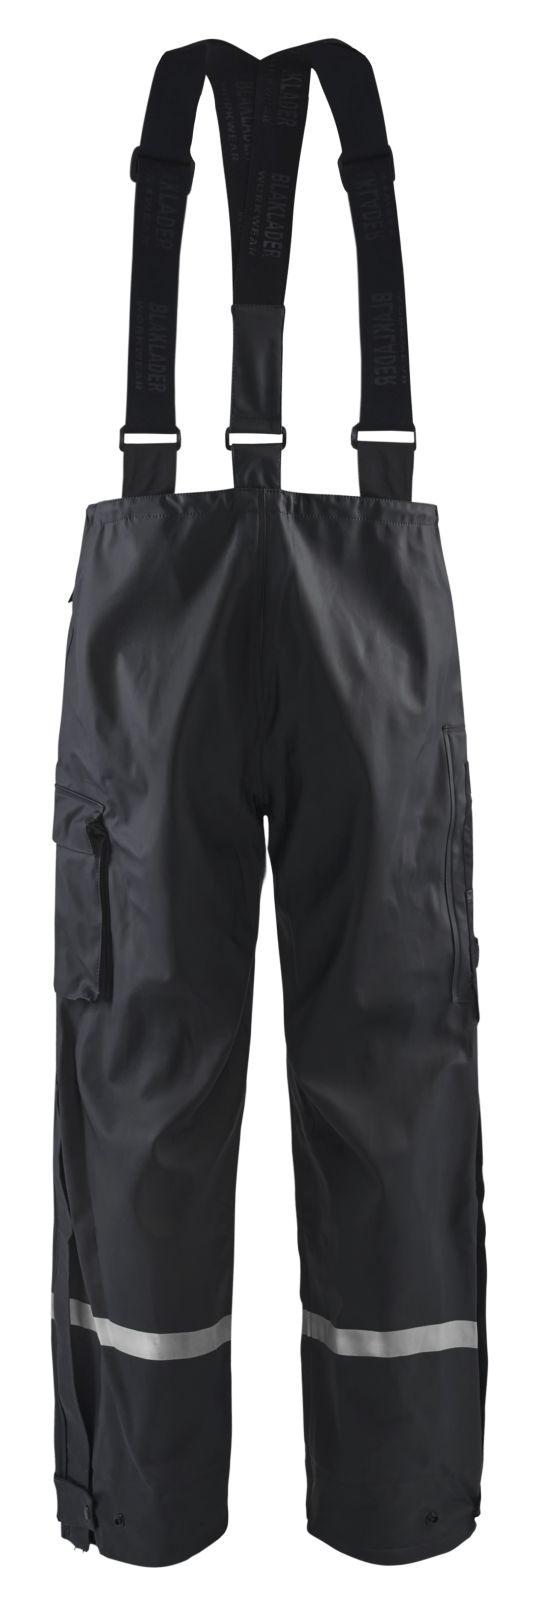 Blaklader Broeken 13022003 High Vis zwart(9900)